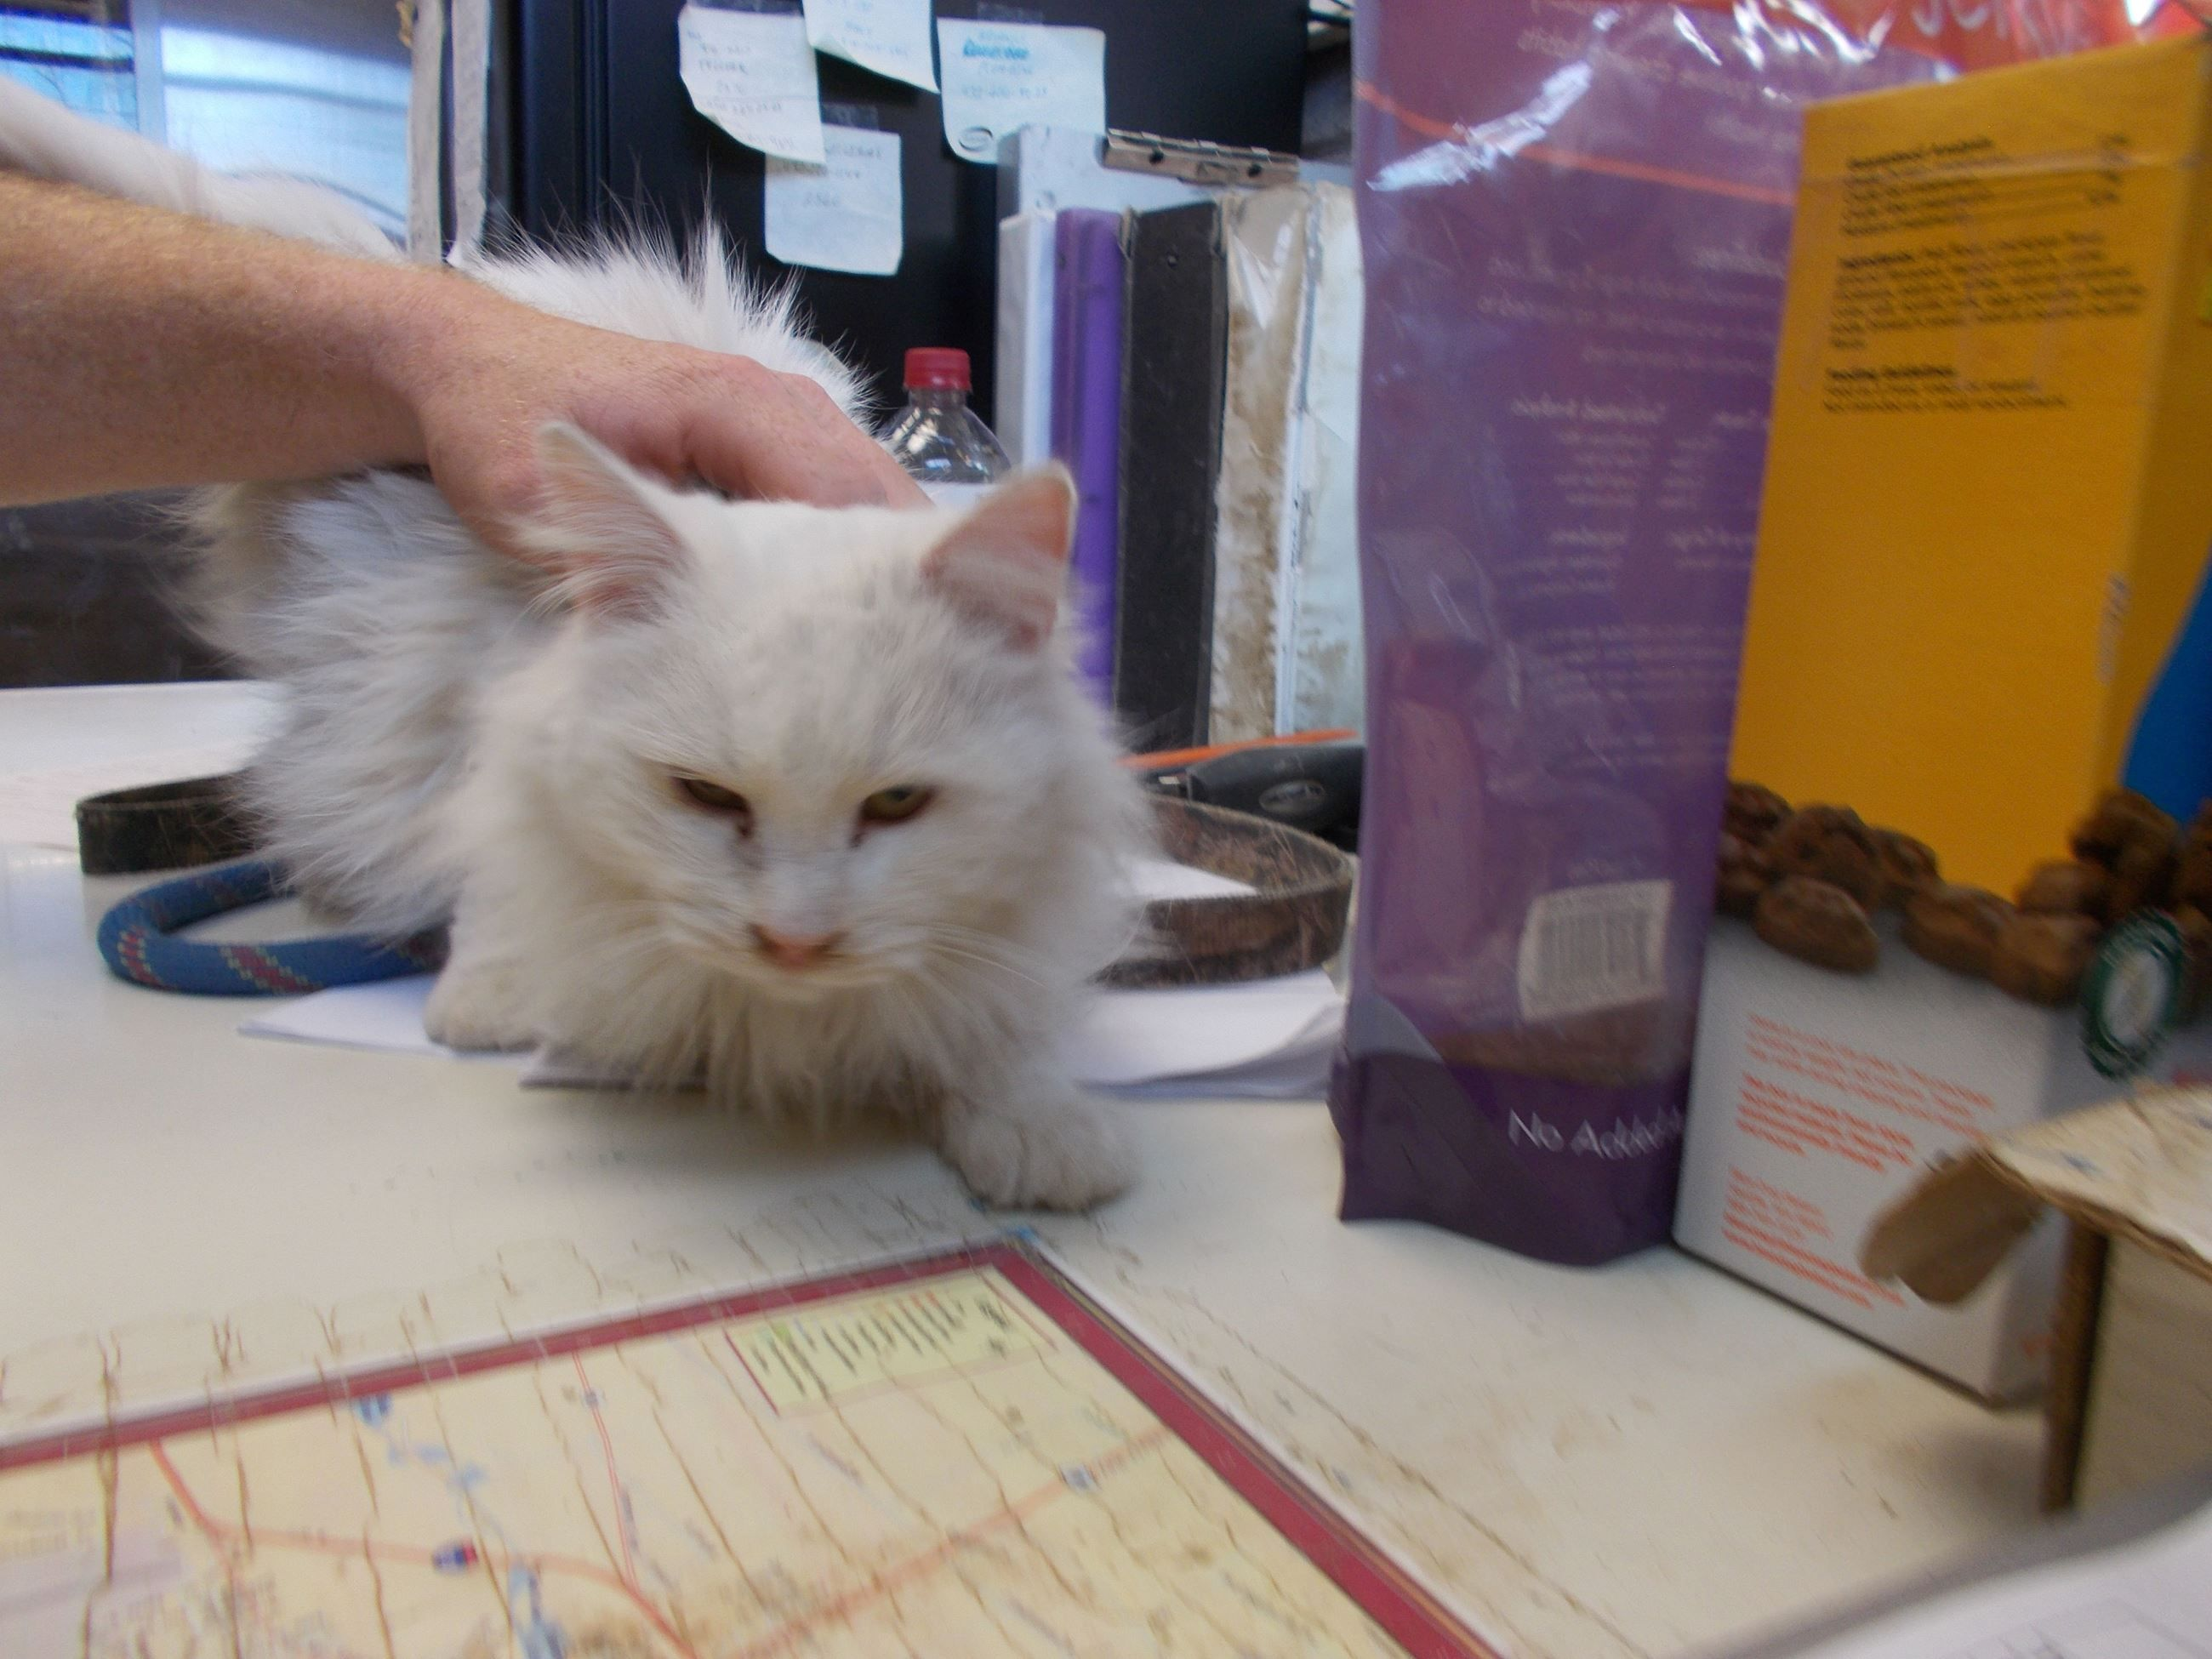 C7 dscn3482 animal shelter animals cute animals